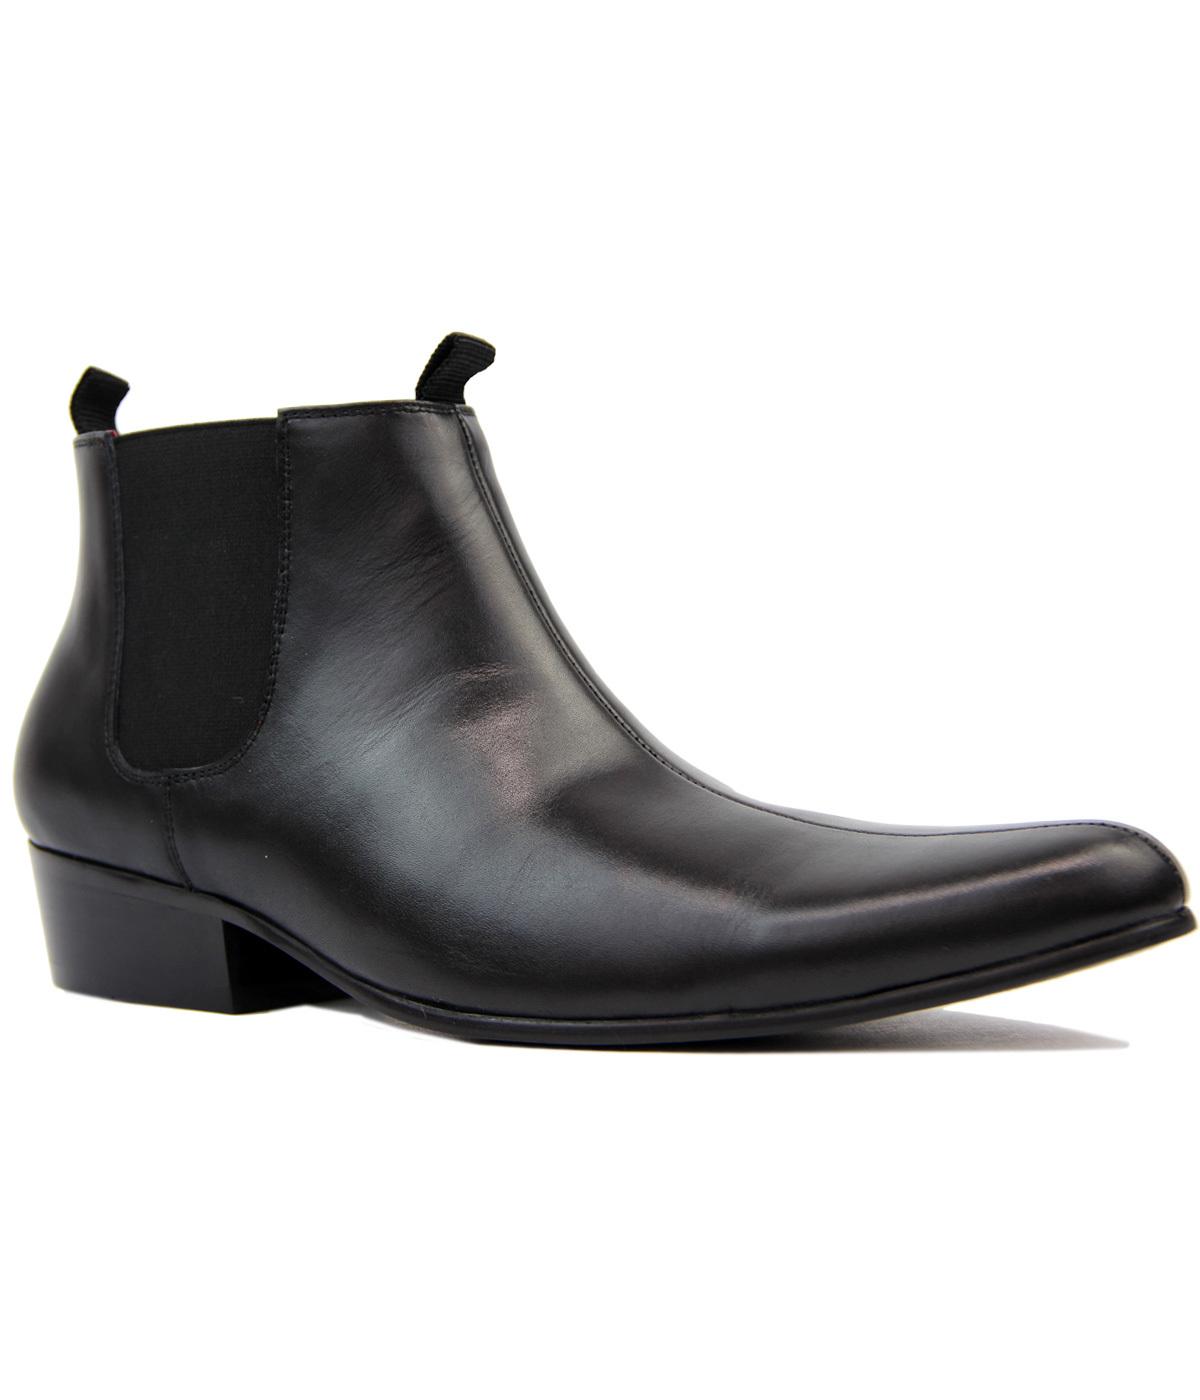 Lightfoot MADCAP ENGLAND Mod Chelsea Boots (BL)